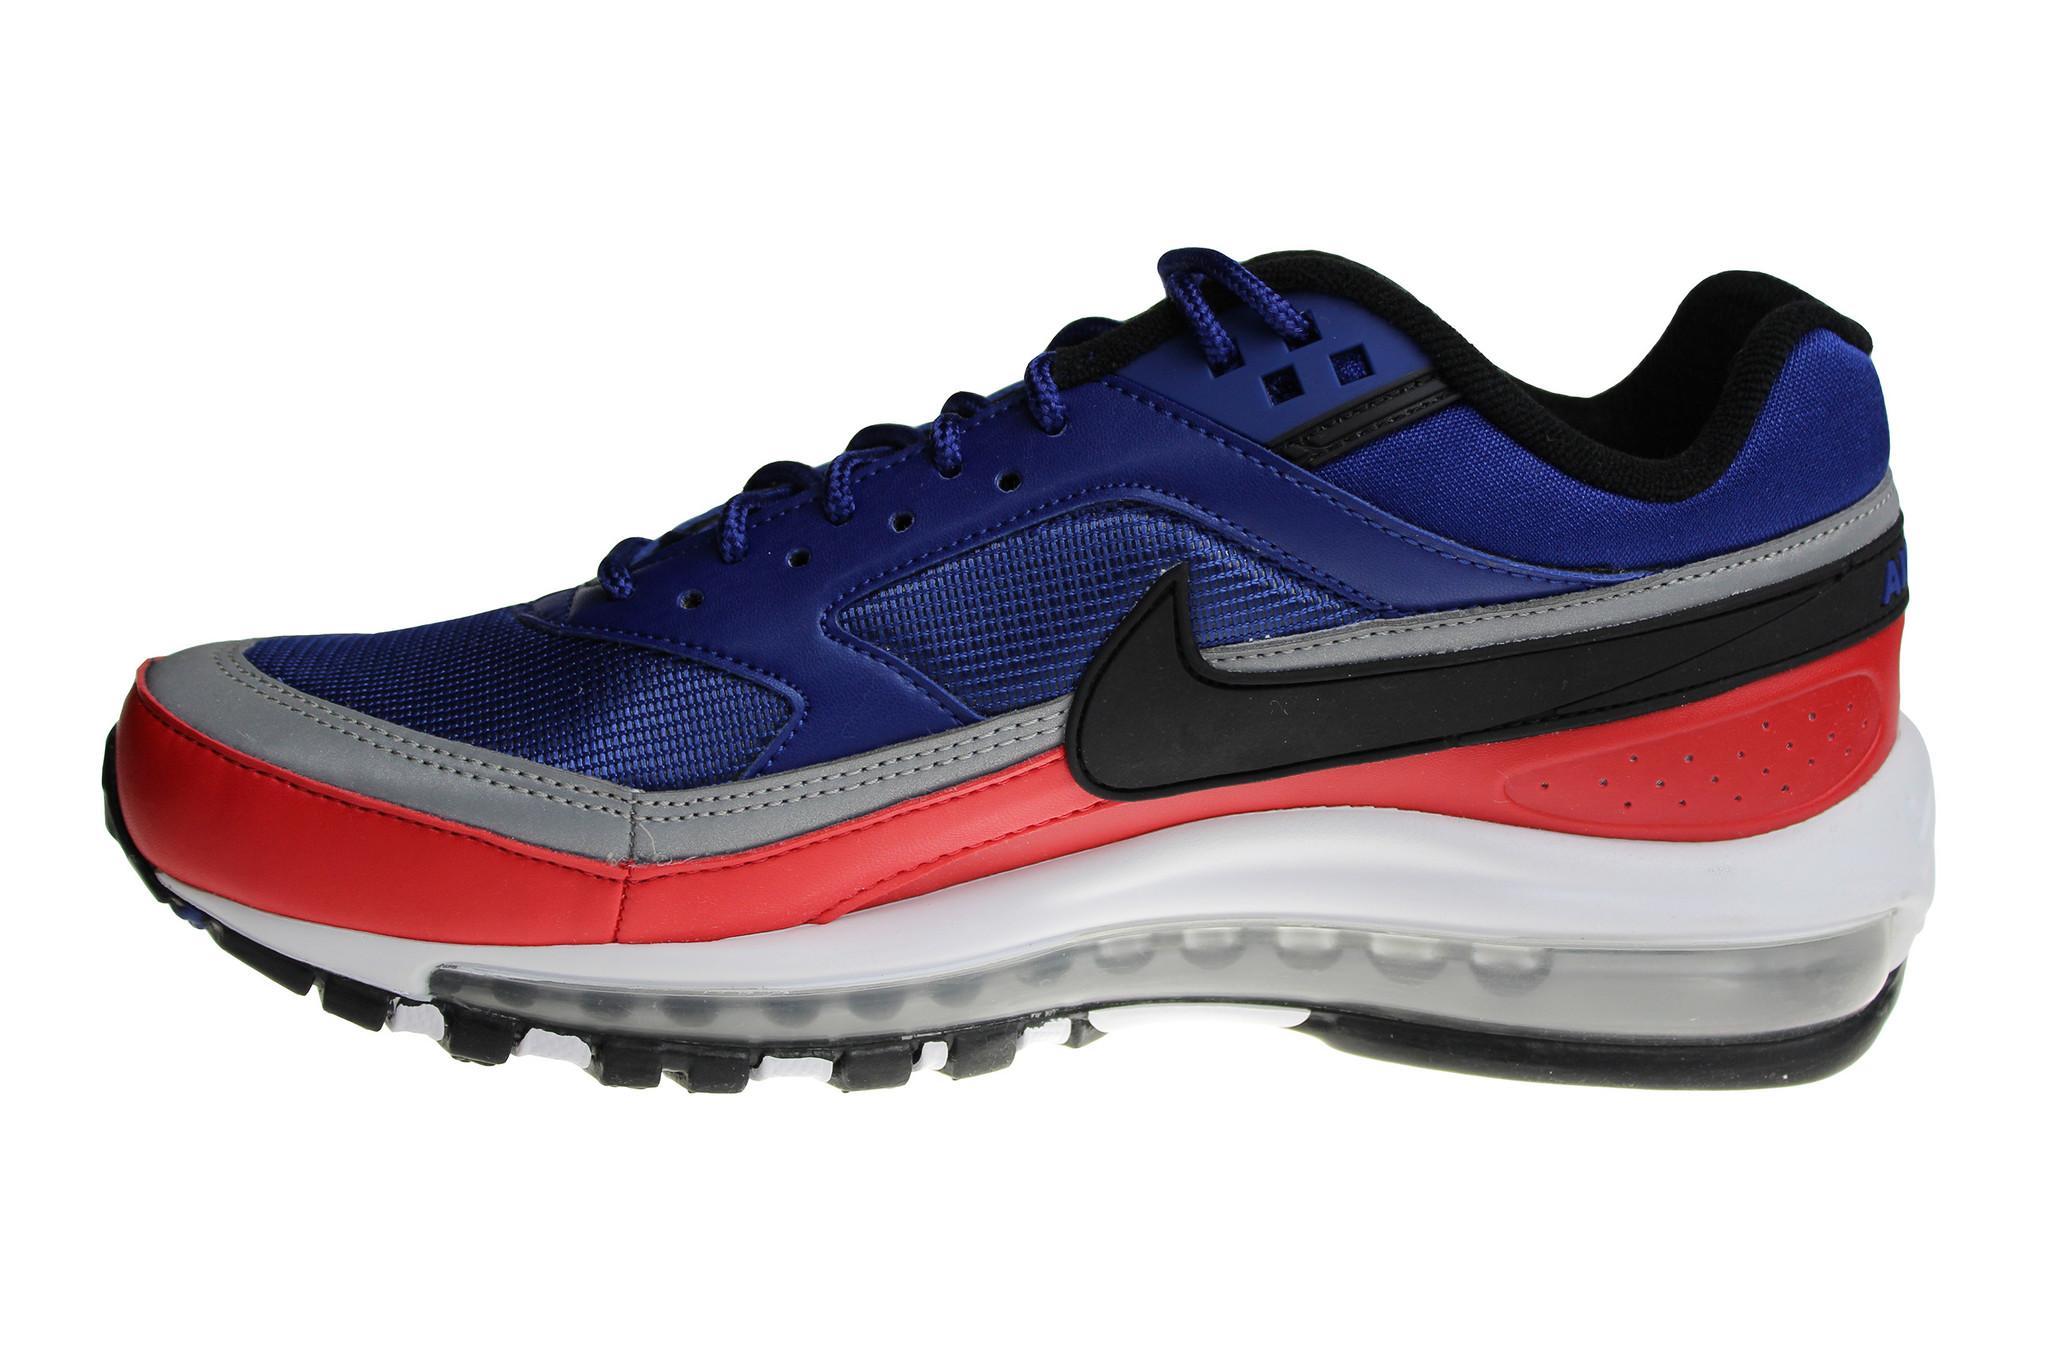 Nike Air Max 97BW (Classic) BlueRedBlackGrayWhite AO2406 400 Men's Sport Shoes